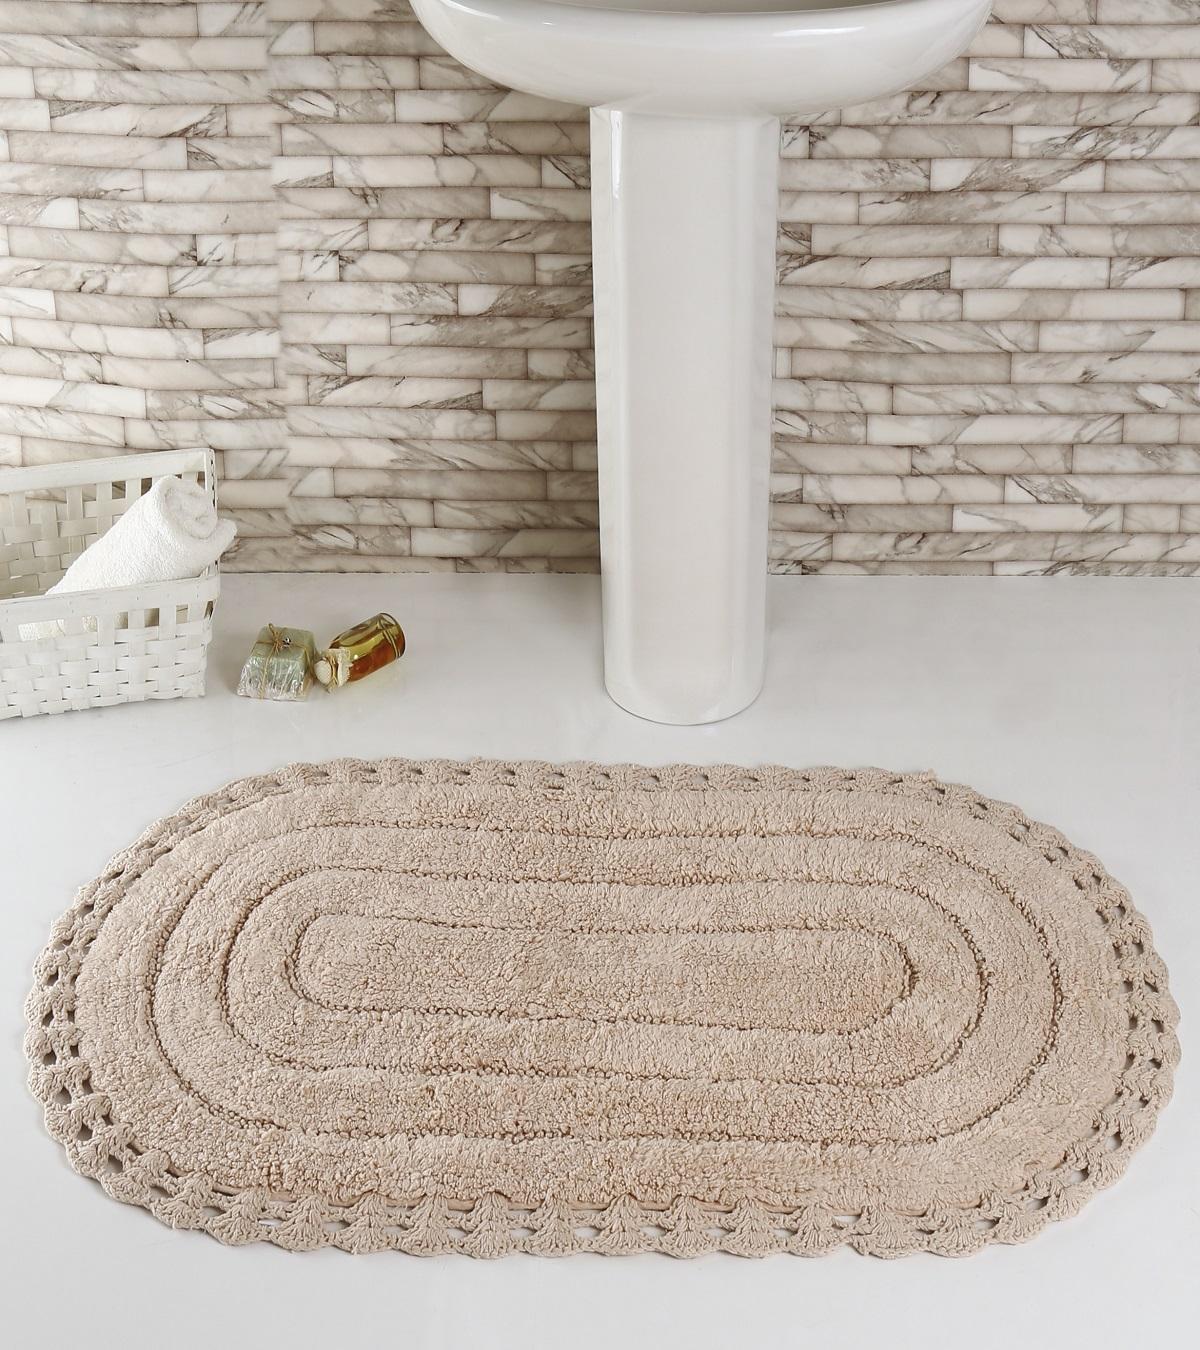 Коврик для ванной Karna Modalin. Yana, цвет: пудровый, 60 х 100 см5025/CHAR005